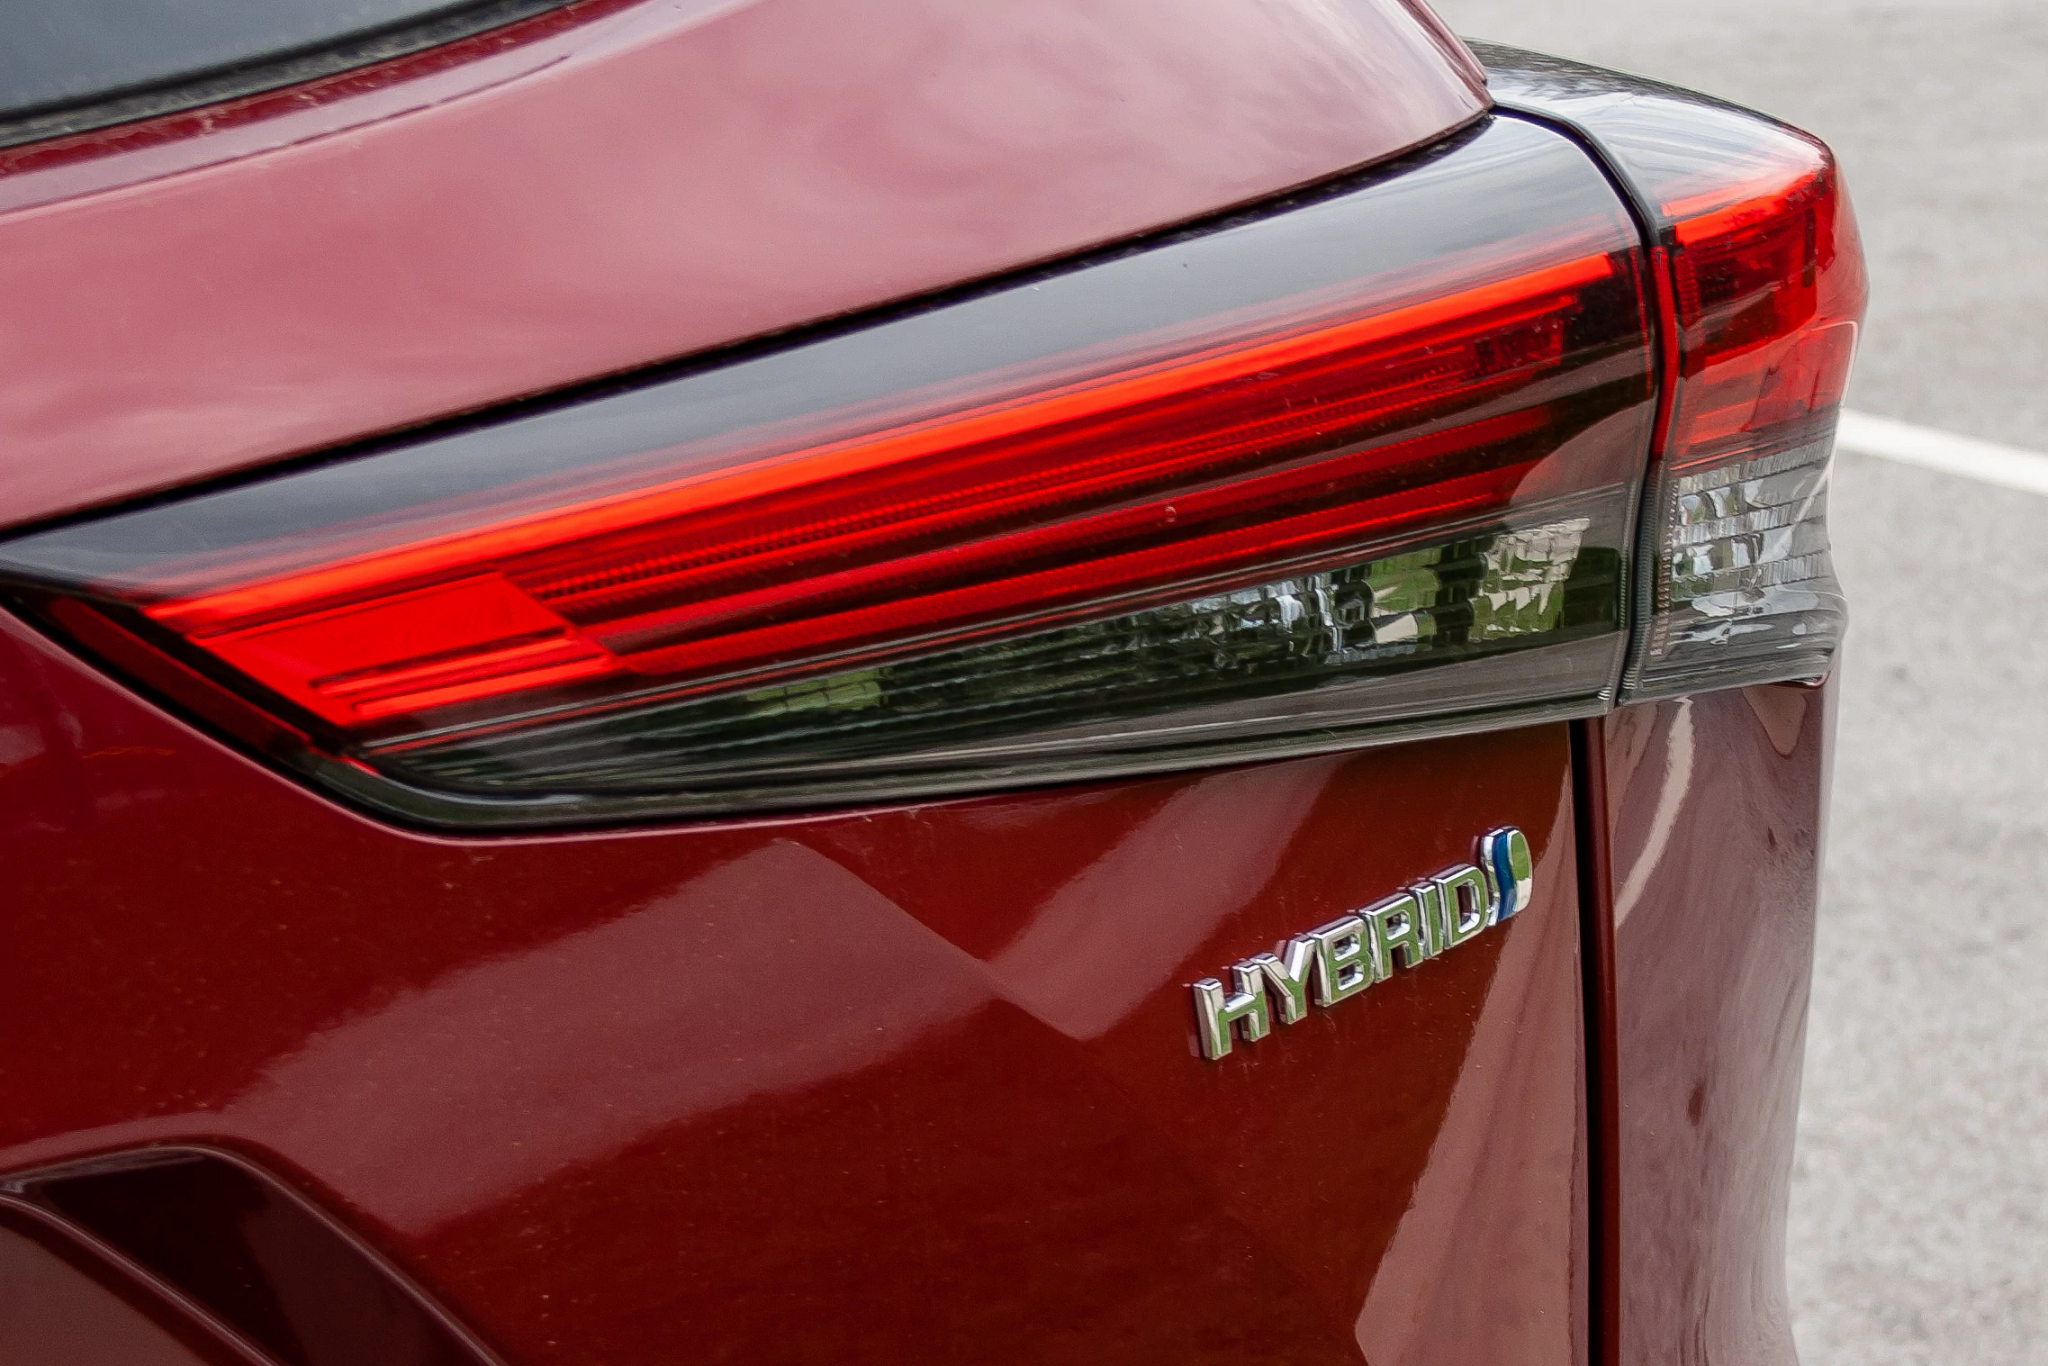 toyota-highlander-hybrid-2020-03-badge--exterior--red--taillights.jpg